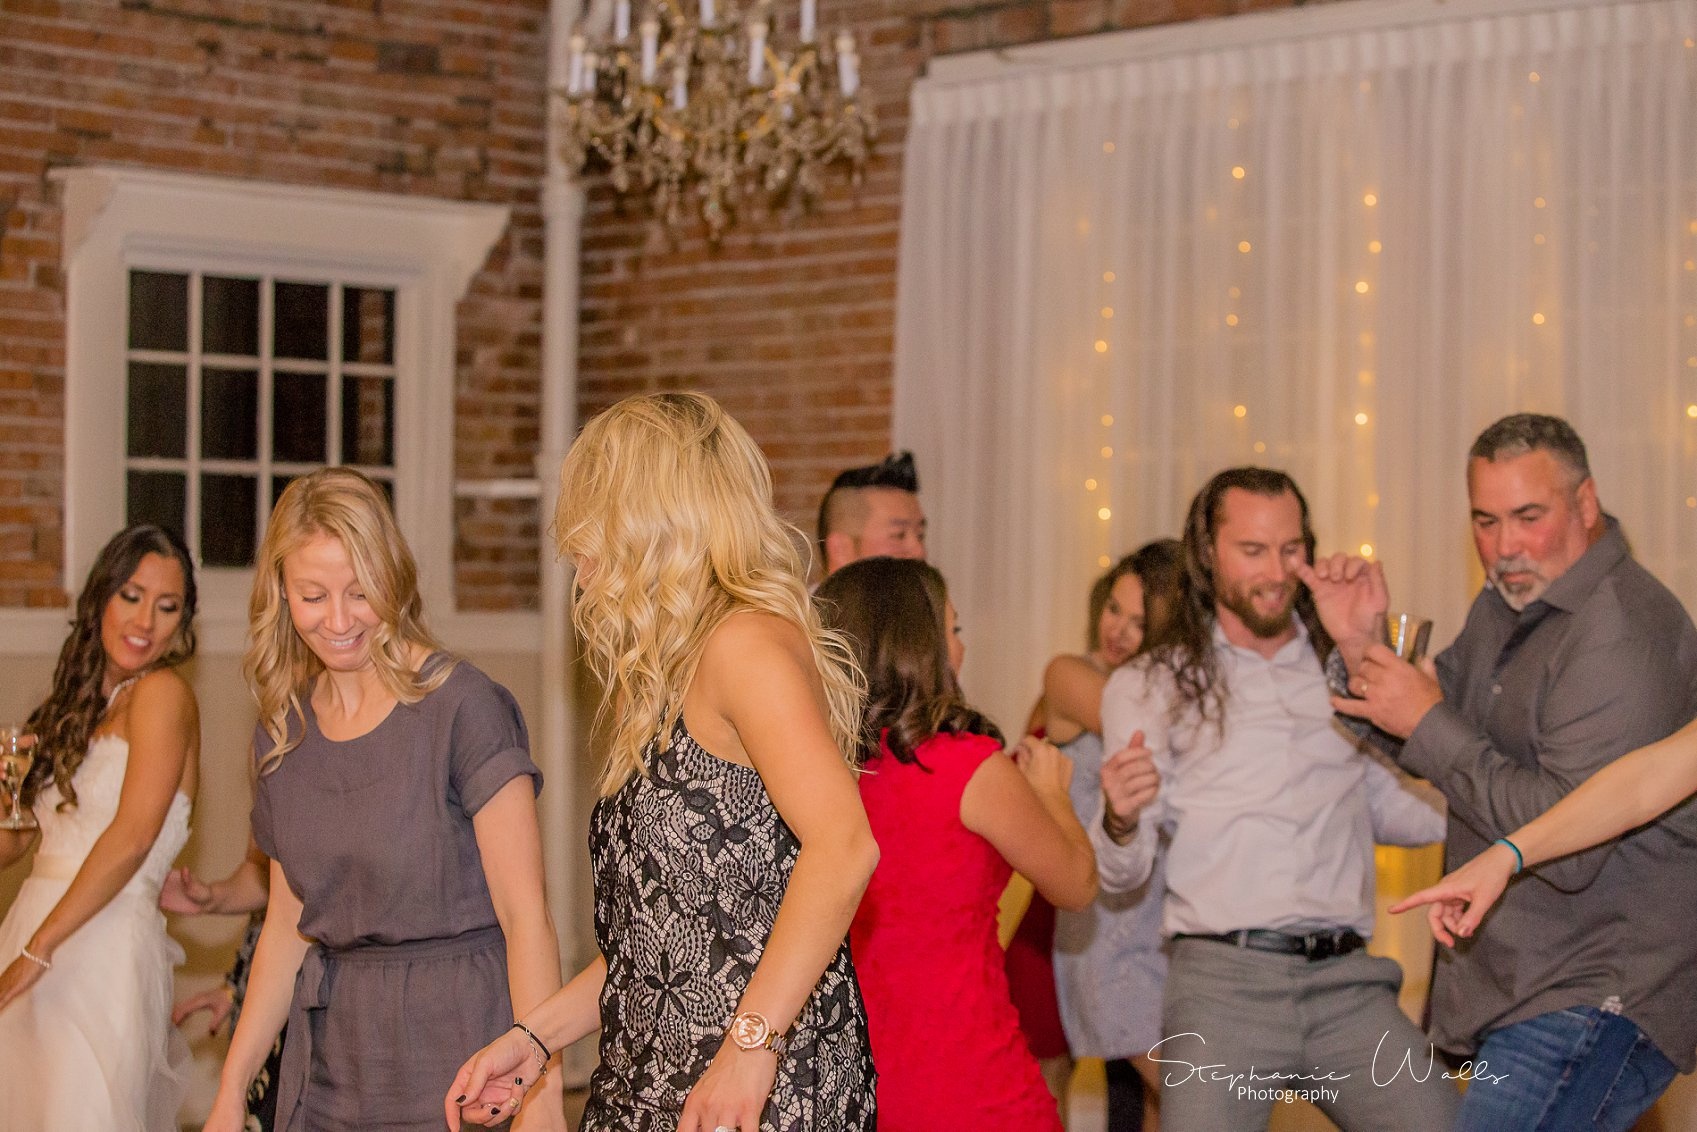 1st Dance Dancing 175 KK & Zack | Hollywood Schoolhouse Wedding | Woodinville, Wa Wedding Photographer